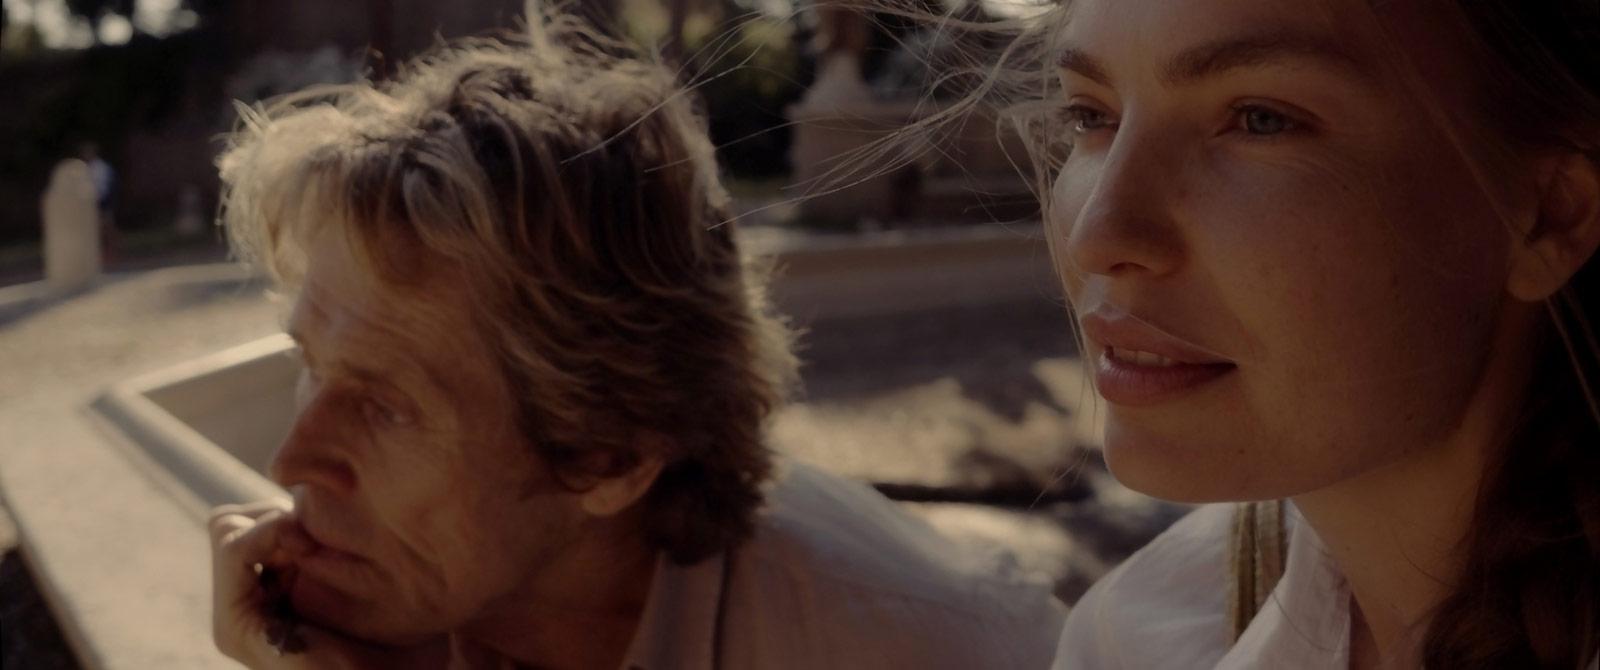 Willem Dafoe, Cristina Chiriac dans Tommaso